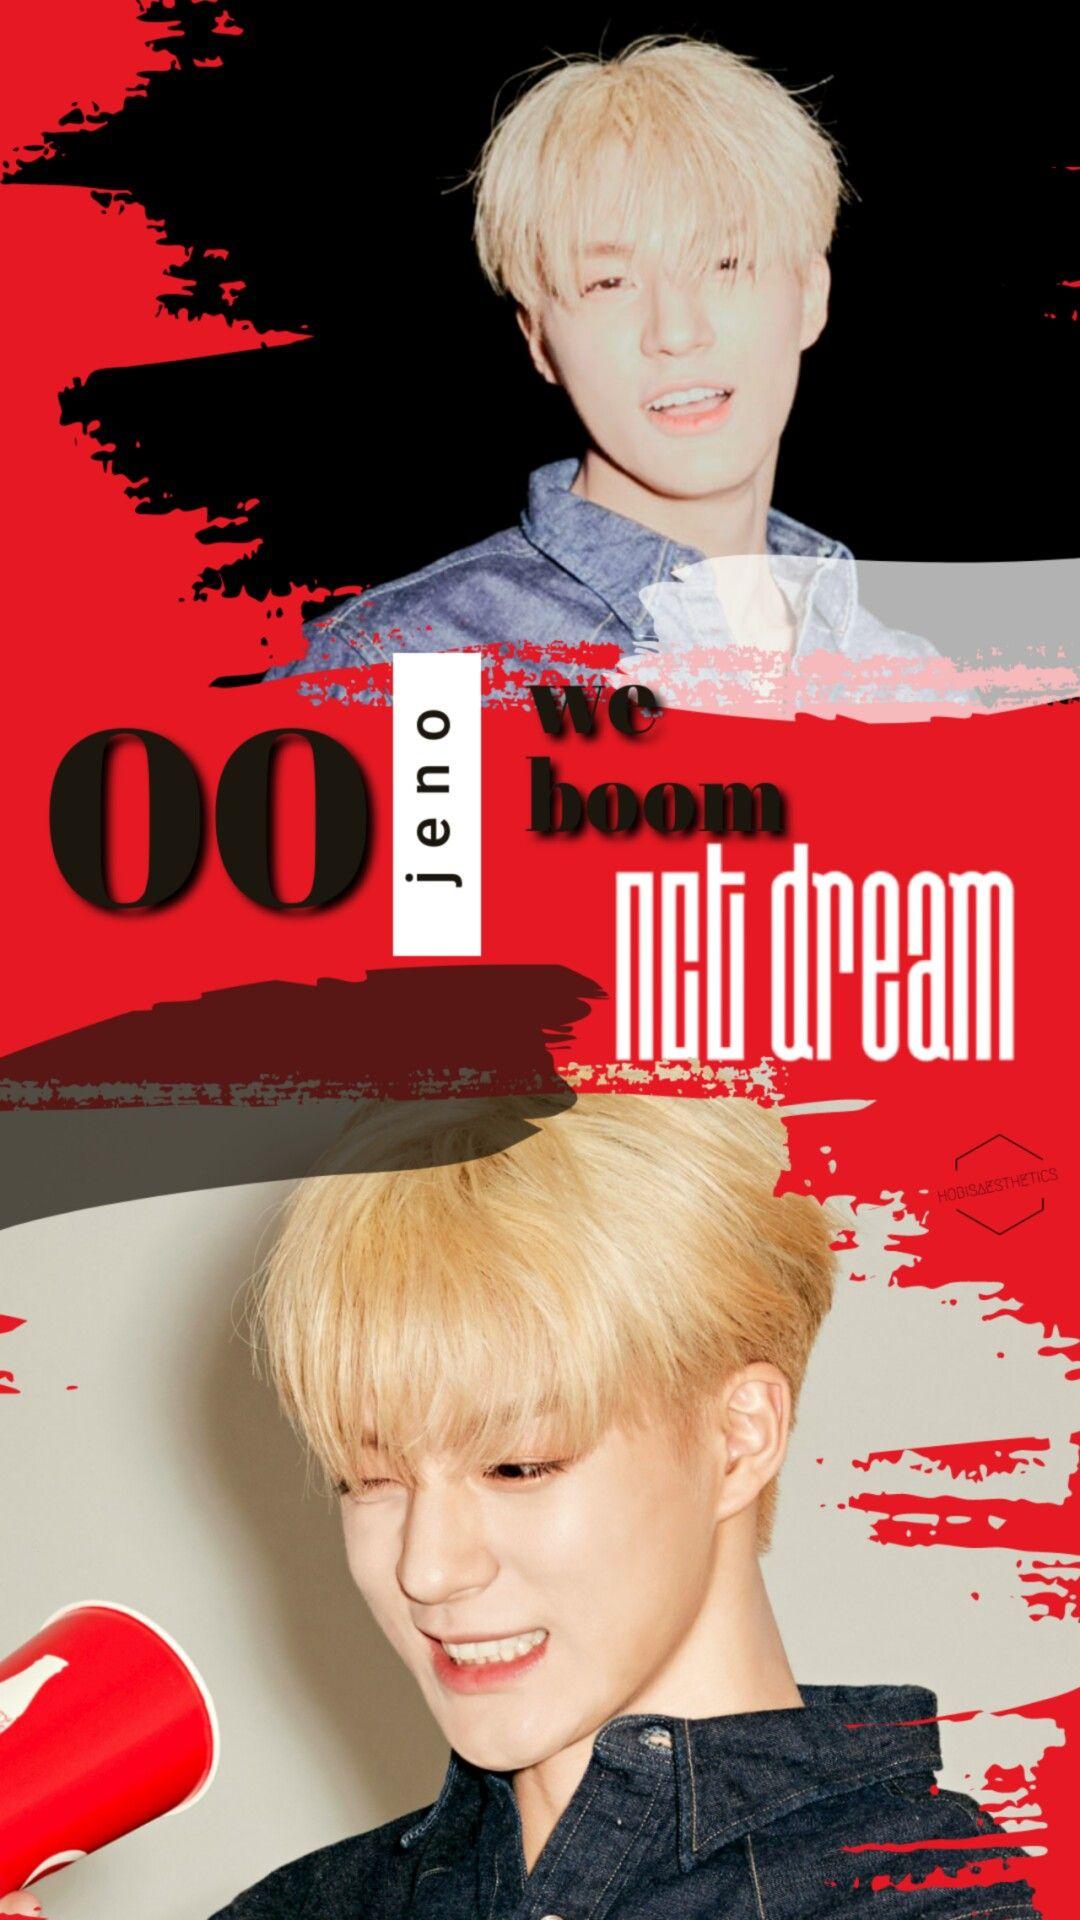 Nct Dream Mv Boom Wallpaper Lockscreen Hd Fondo De Pantalla Winwin Jisung Chenle Haechan Doyoung Yuta Taeil Jen Selebritas Nct Wallpaper Lucu